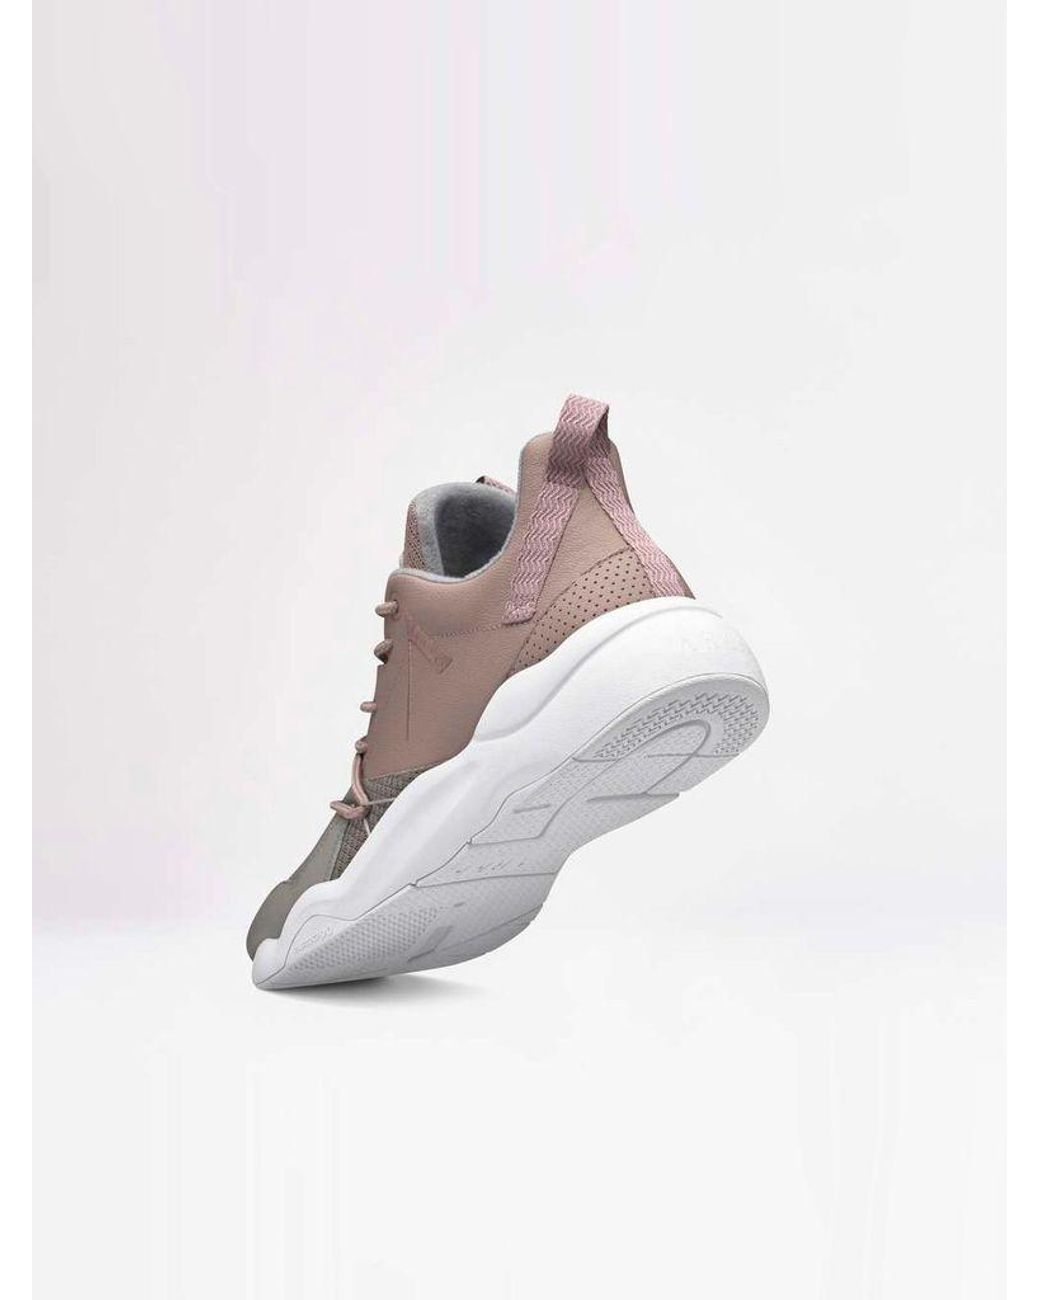 Arkk Asymtrix Mesh F-PRO90 Herren Sneaker Turnschuhe Schuhe Weiß NEU ML3014-2210